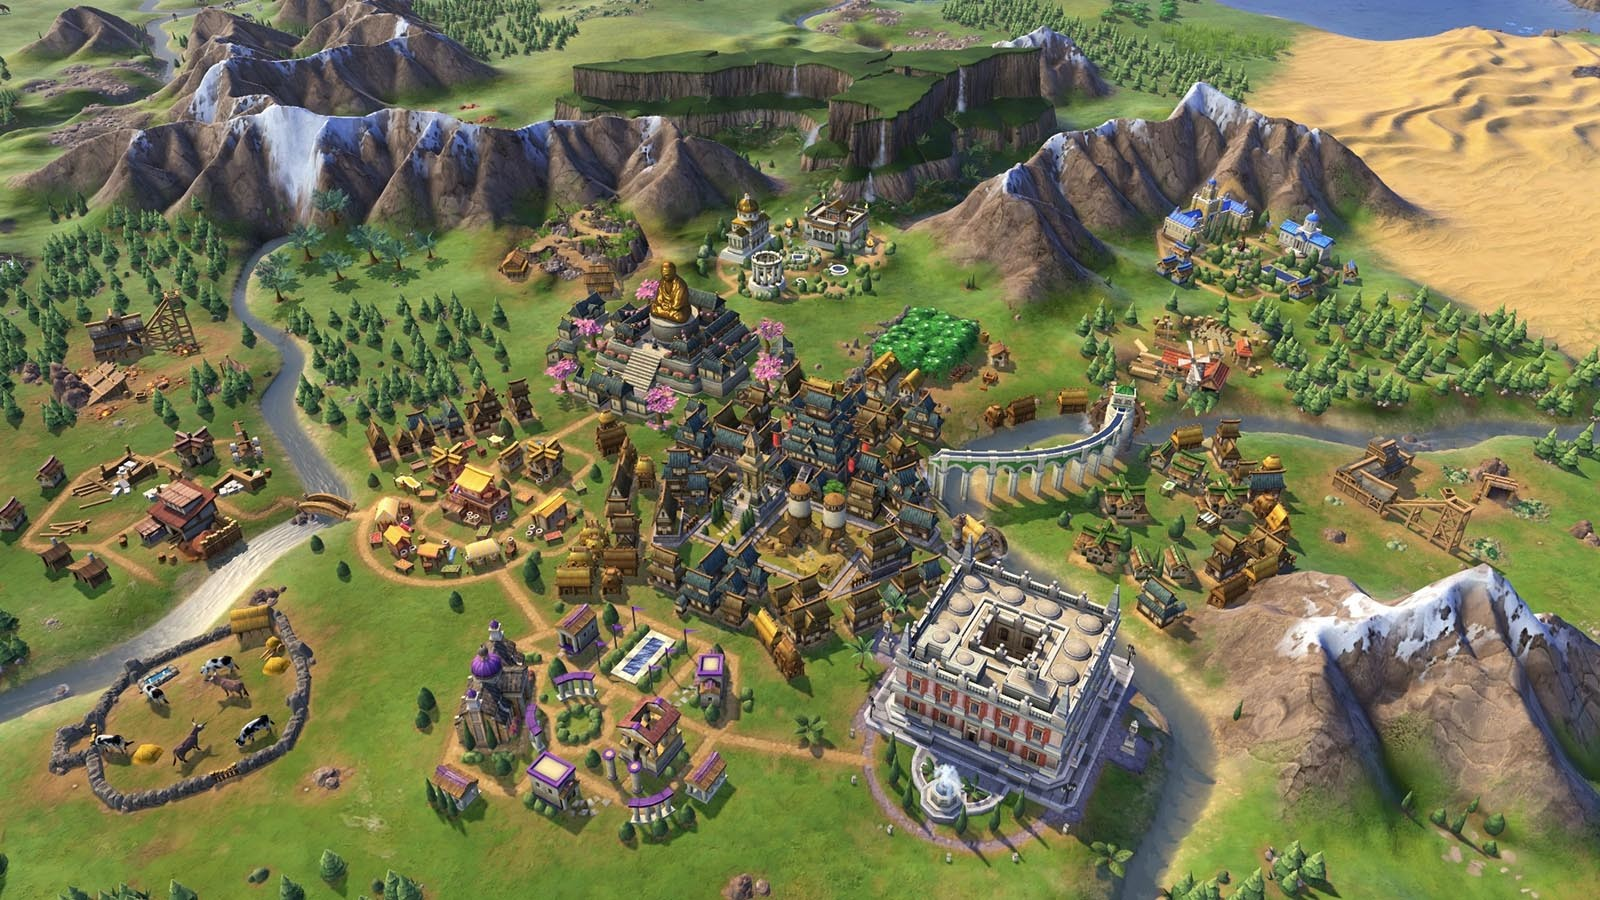 Sid Meier's Civilization VI: Gathering Storm [Steam CD Key] for PC - Buy now